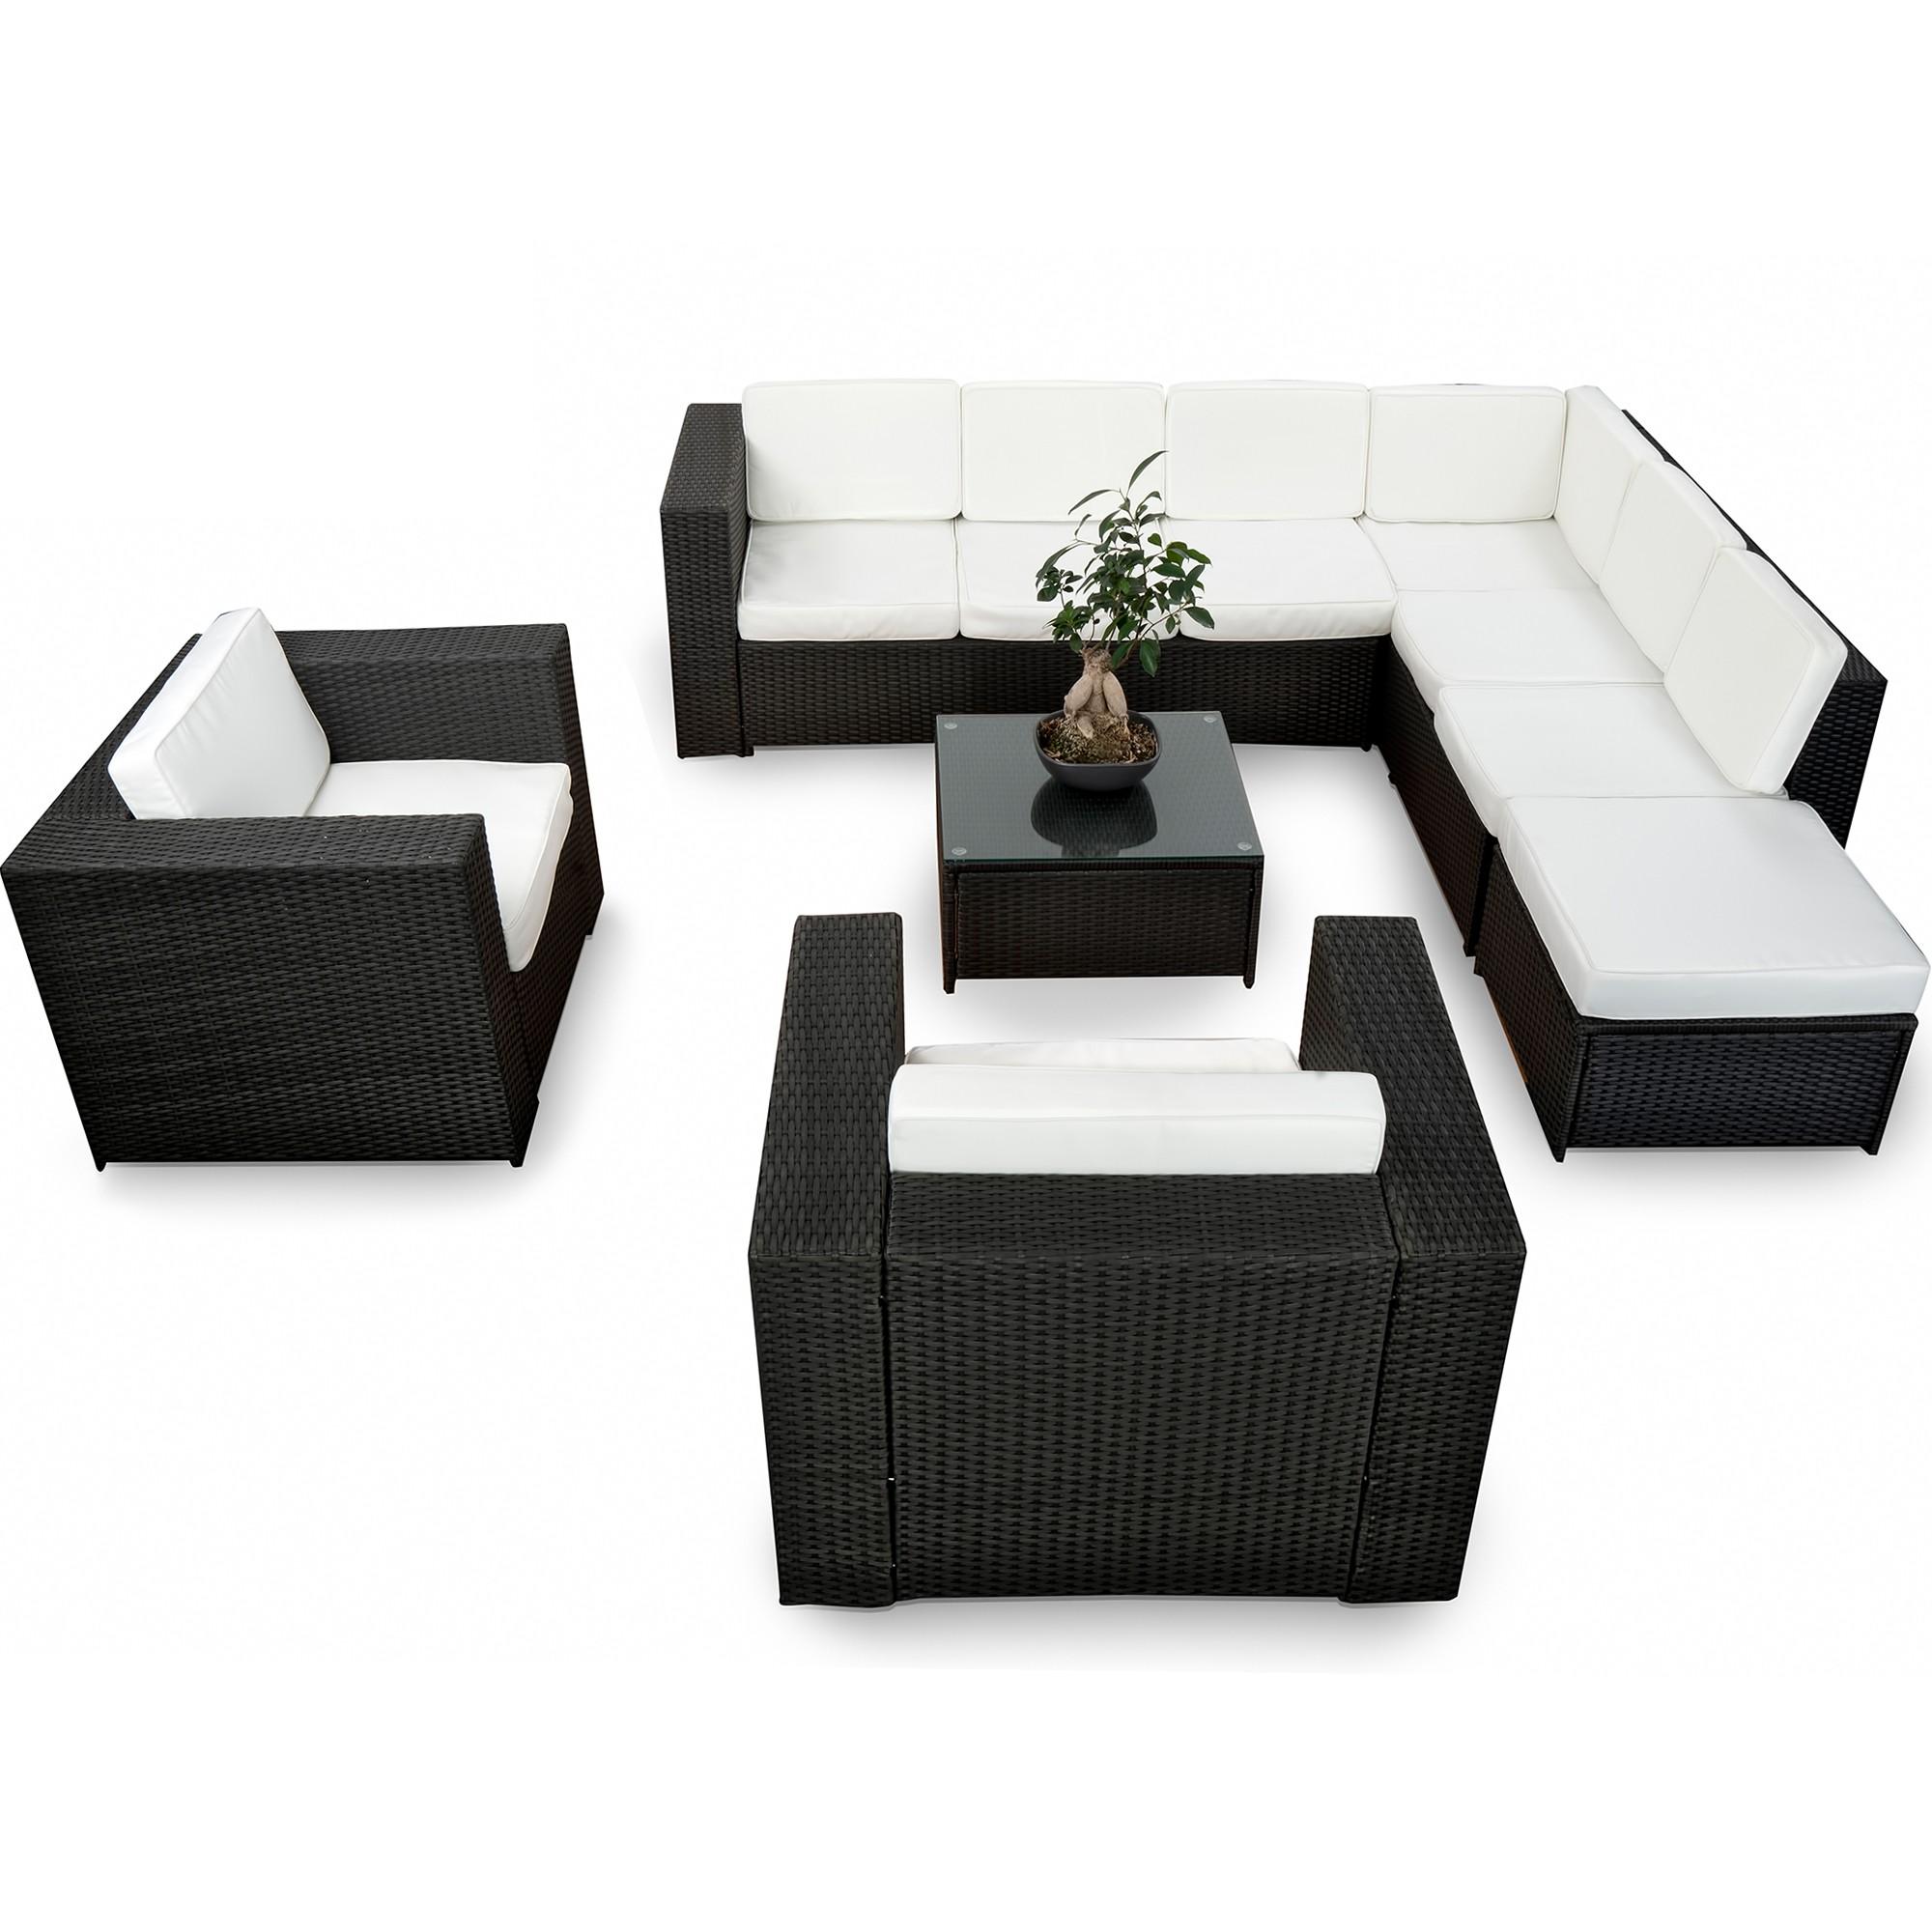 garten lounge set g nstig lounge set garten kaufen. Black Bedroom Furniture Sets. Home Design Ideas